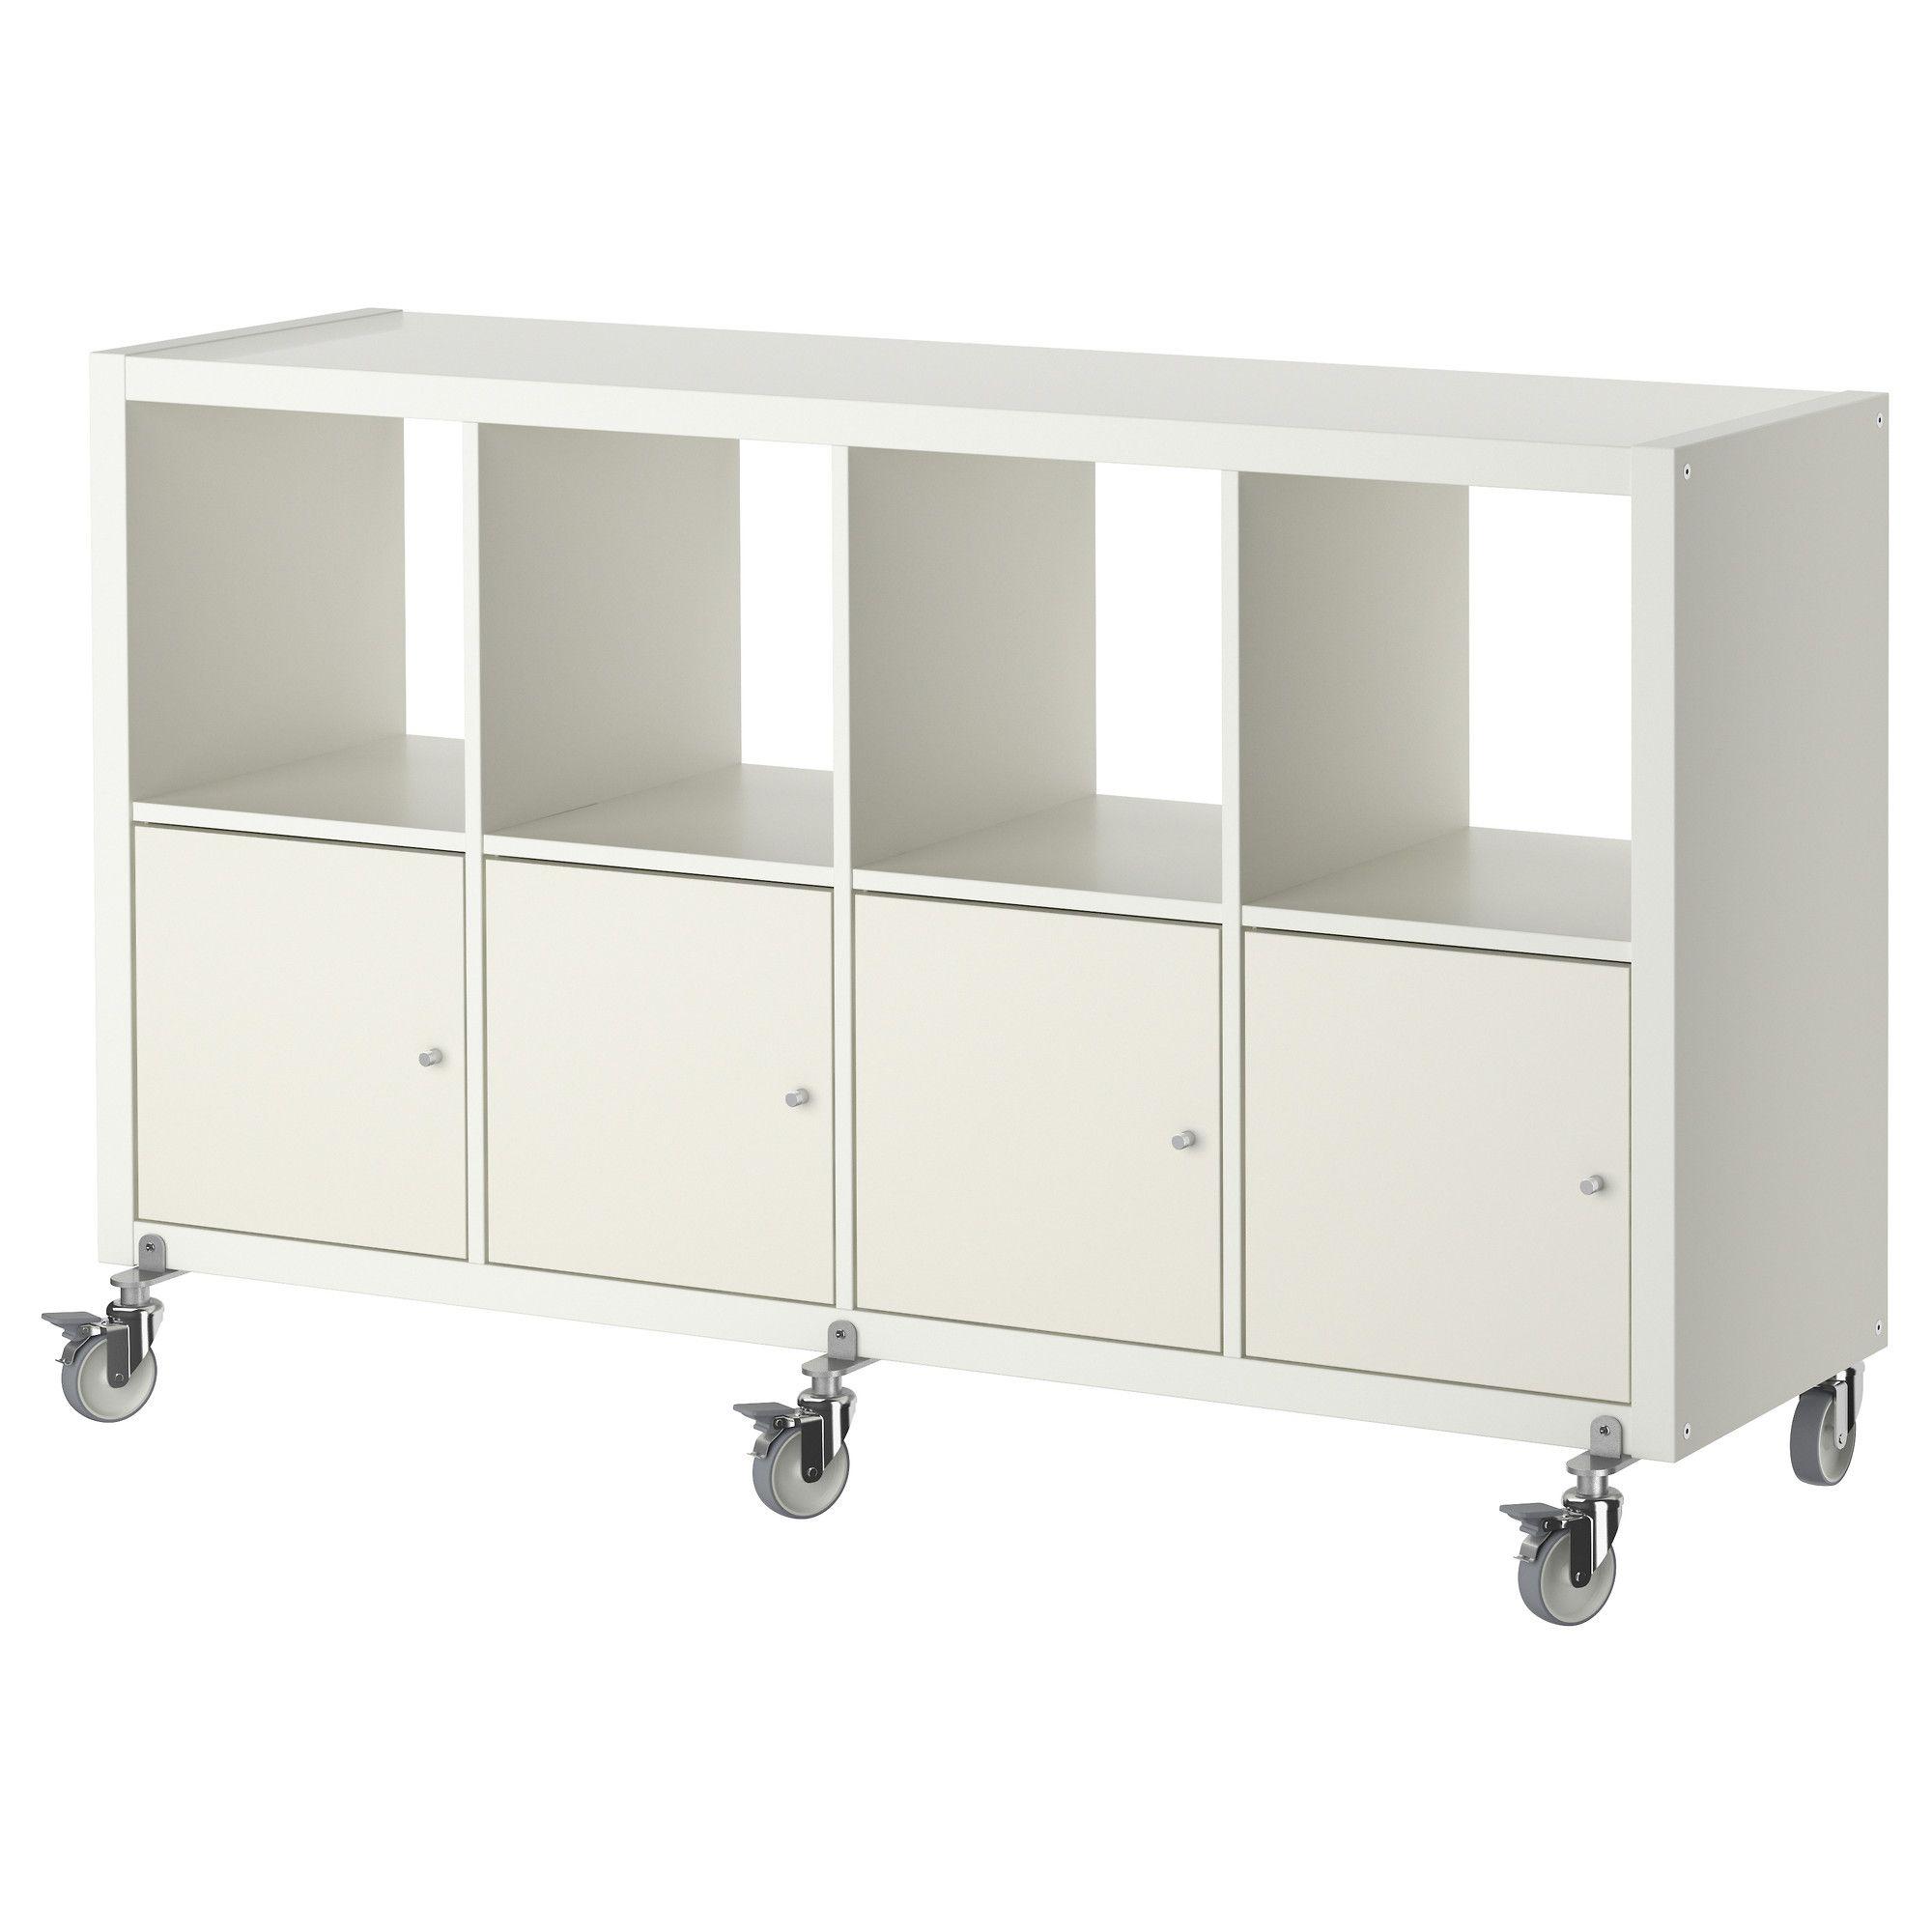 Besta shelf unit with door - Kallax Shelf Unit On Casters With 4 Doors White Ikea 169 99 Online 2